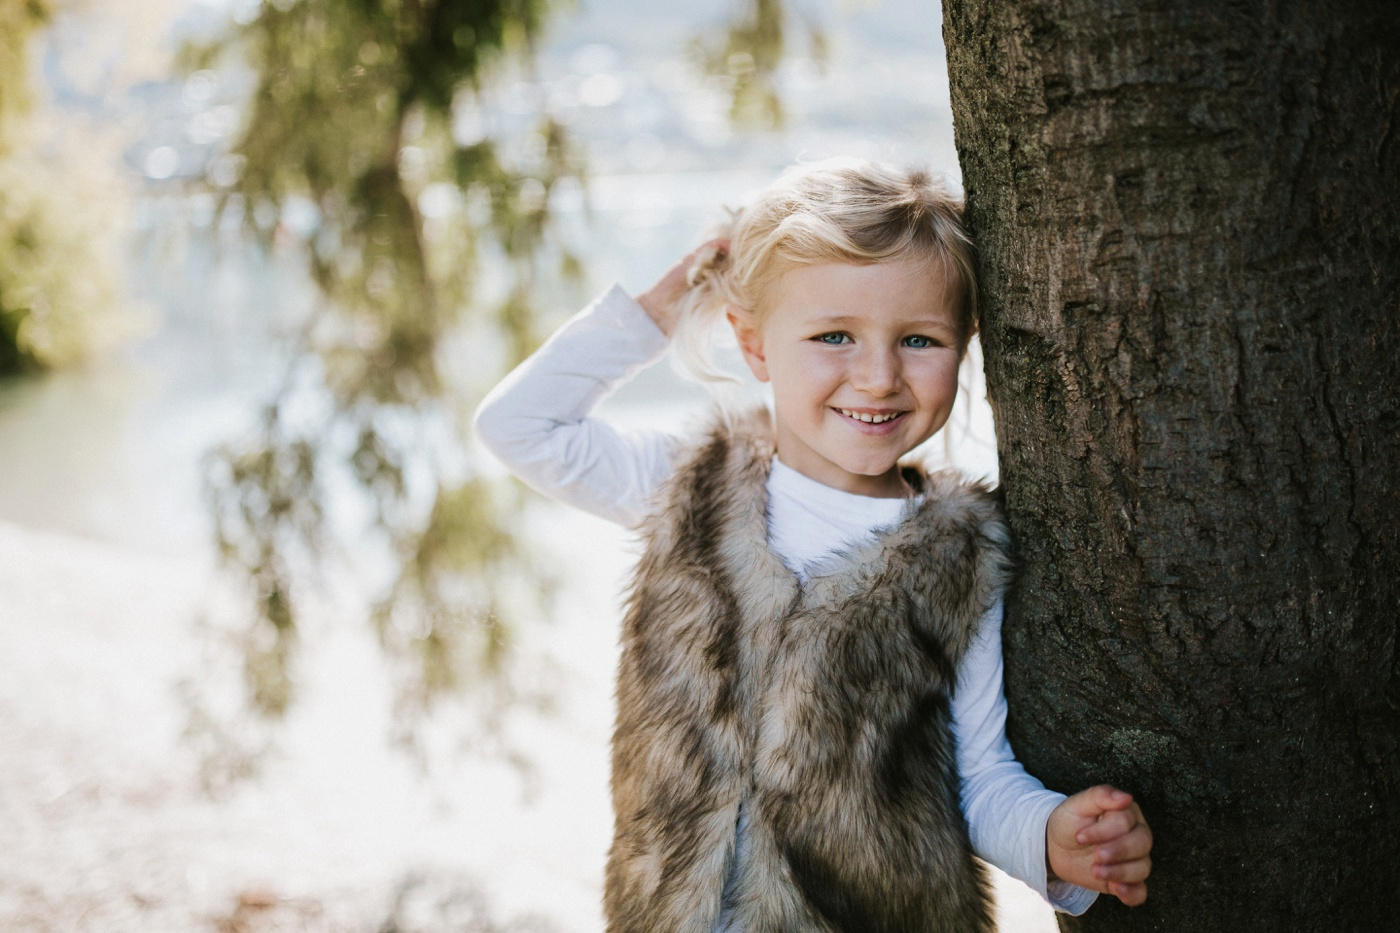 Blake-Lily-Rolig-Lekfull-Familjesession-Familjefotograf-Stockholm-Orebro_11